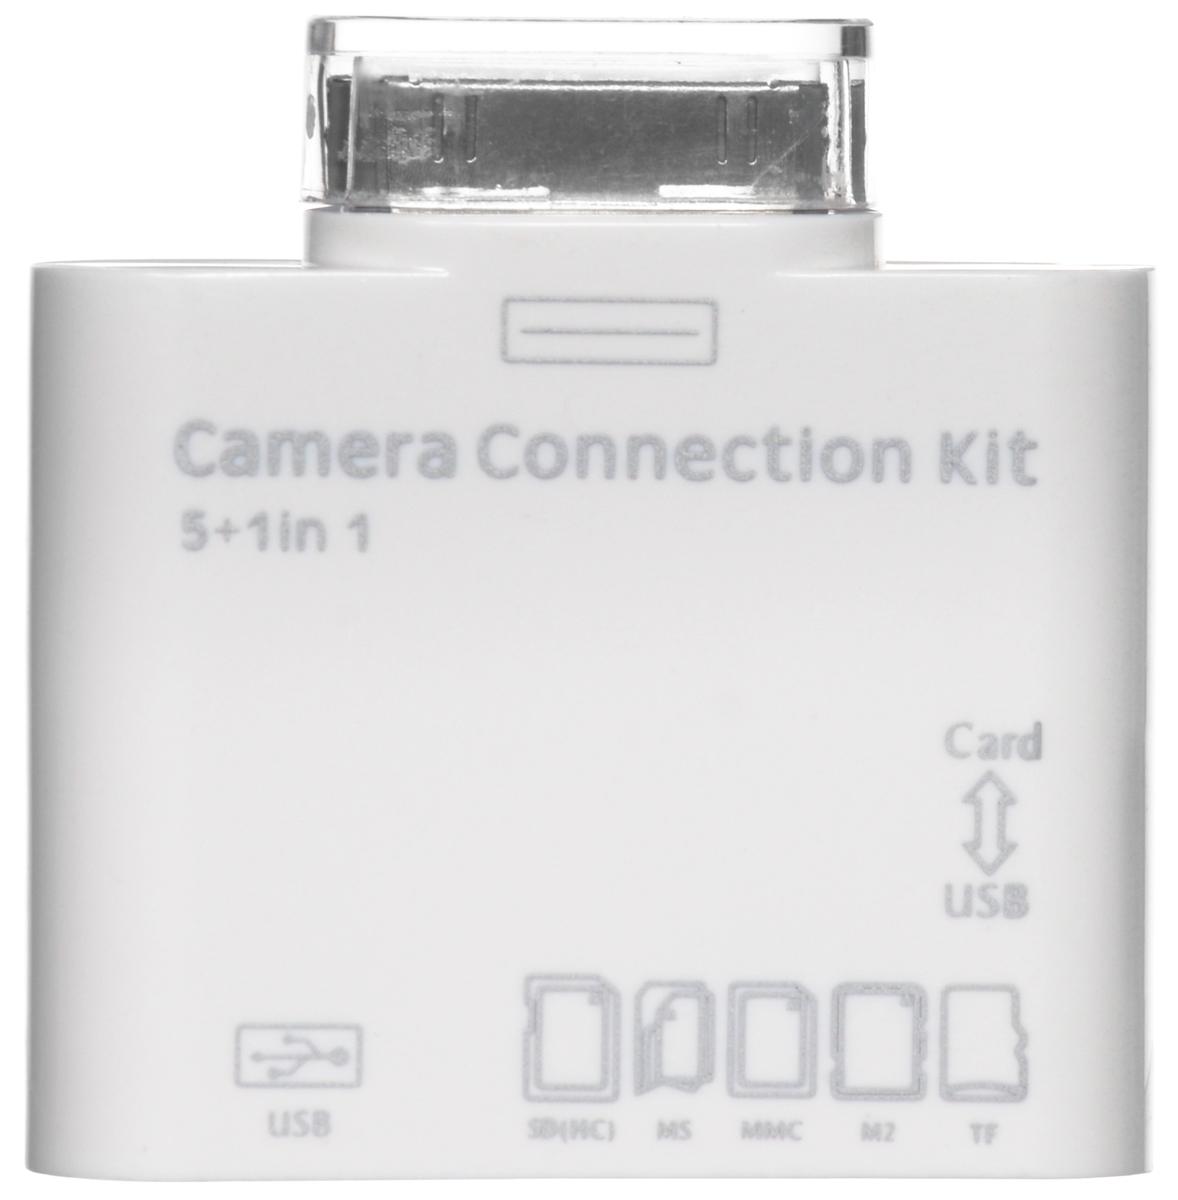 Liberty Project DR02-IPA 5 в 1 картридер для iPad 2/3/iPhoneCD123204Liberty Project DR02-IPA 5 в 1 устройство передачи данных с карт памяти для iPad 2/3/iPhone.